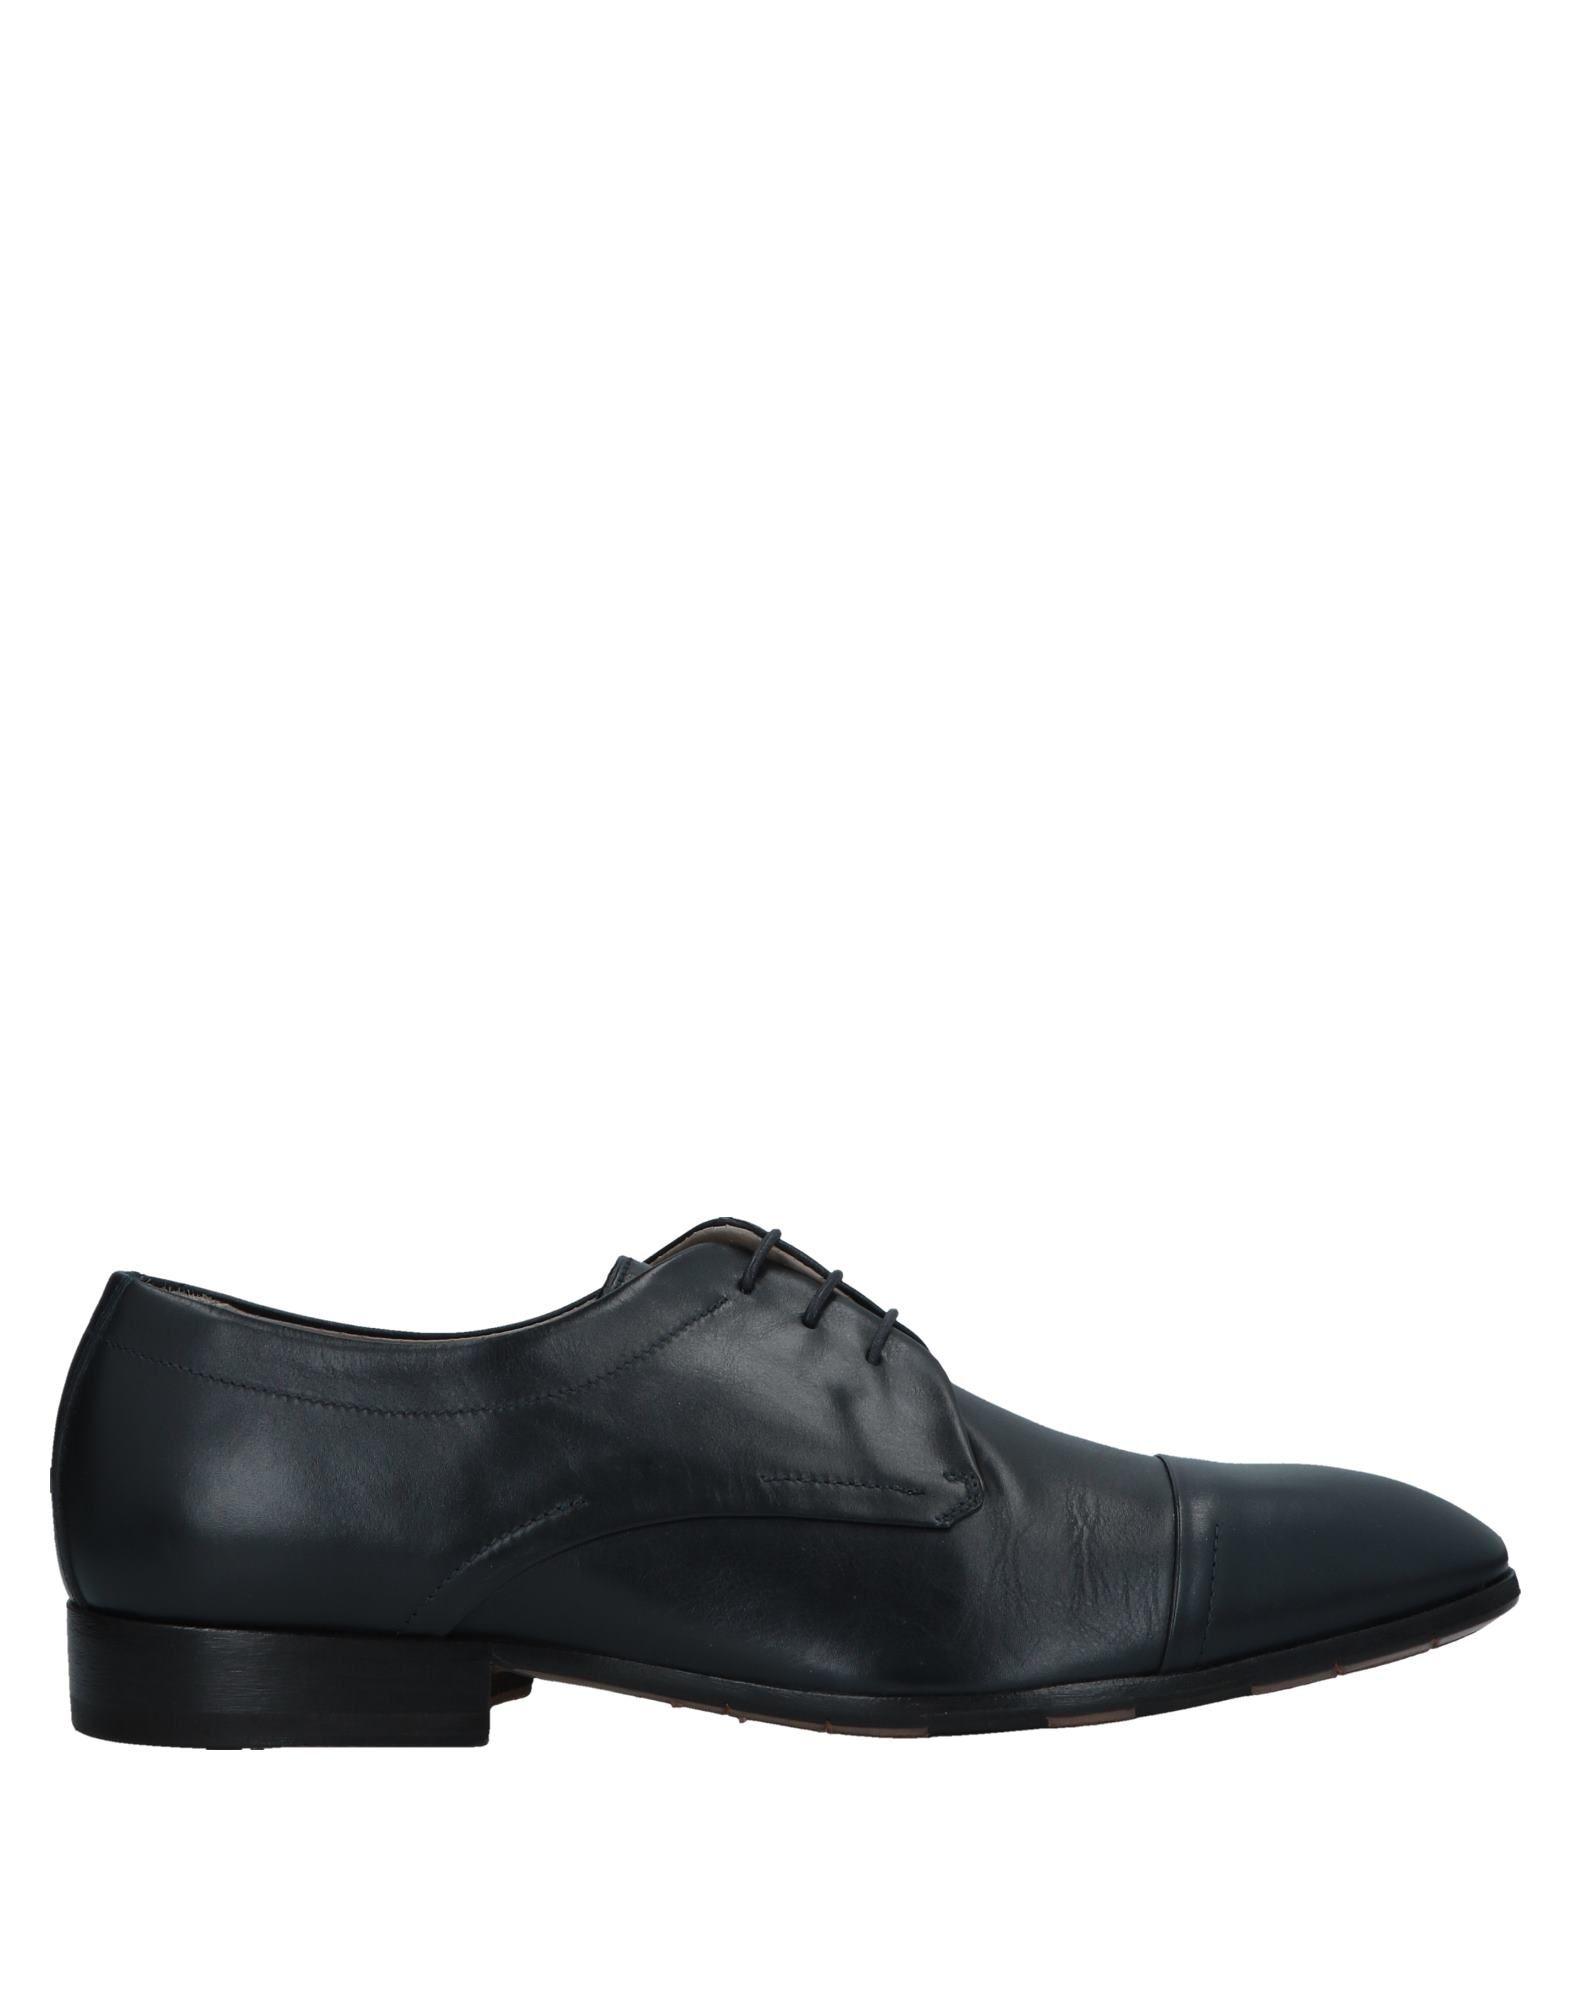 Фото - CARVANI Обувь на шнурках обувь на высокой платформе dkny